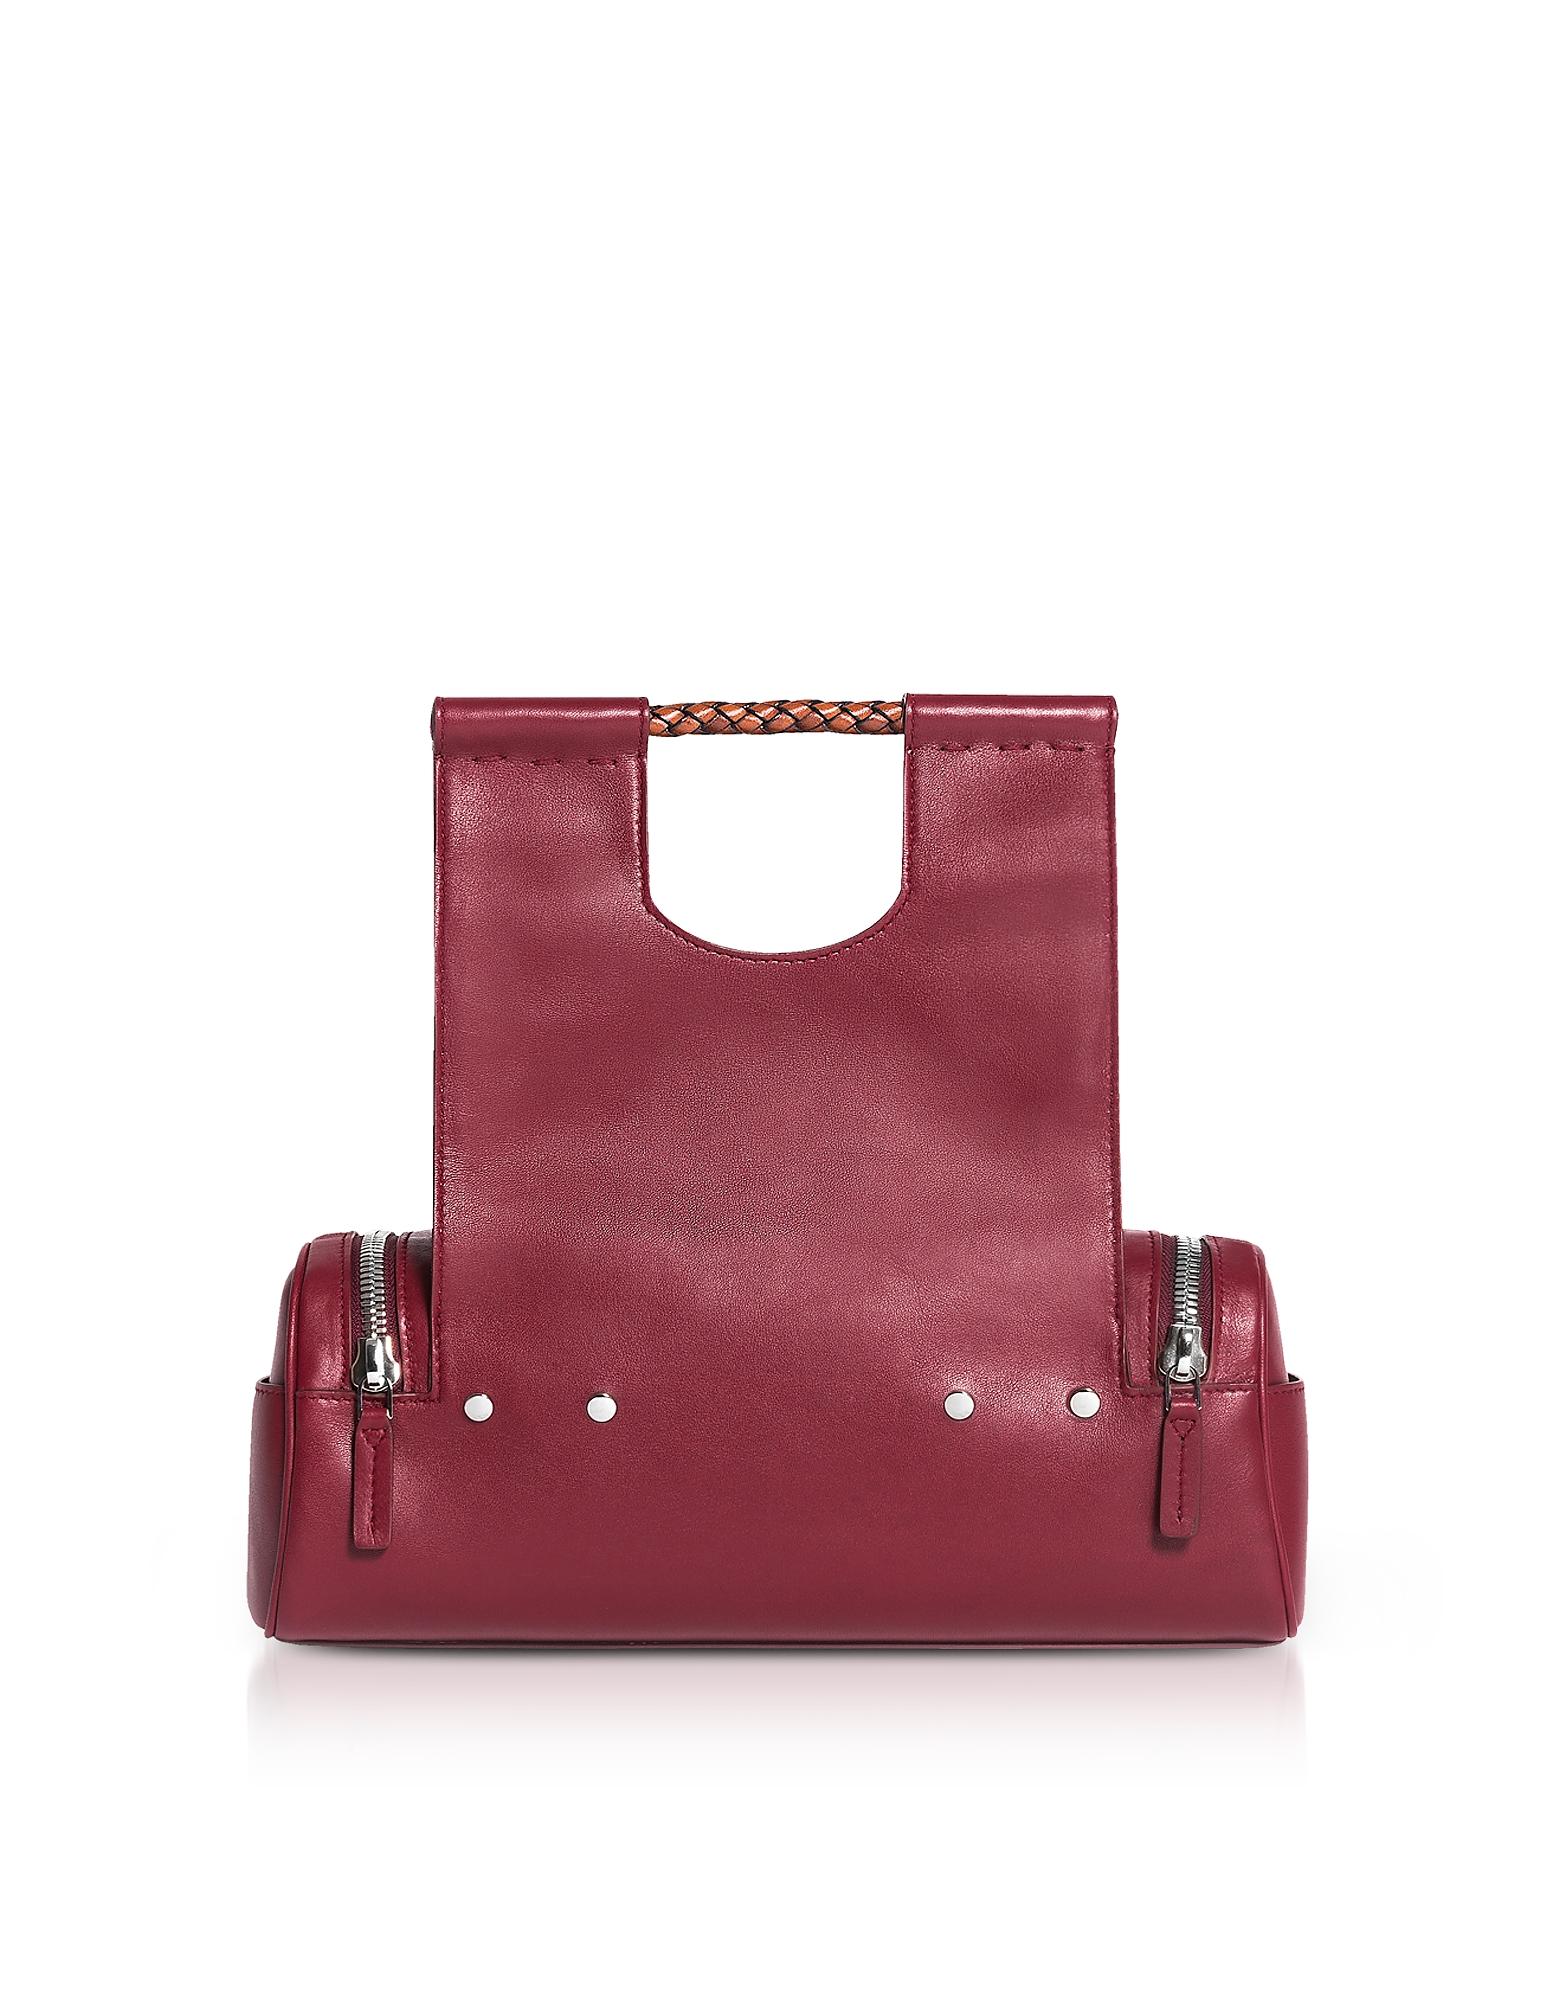 Corto Moltedo Designer Handbags, Genuine Leather Priscilla Medium Tote Bag